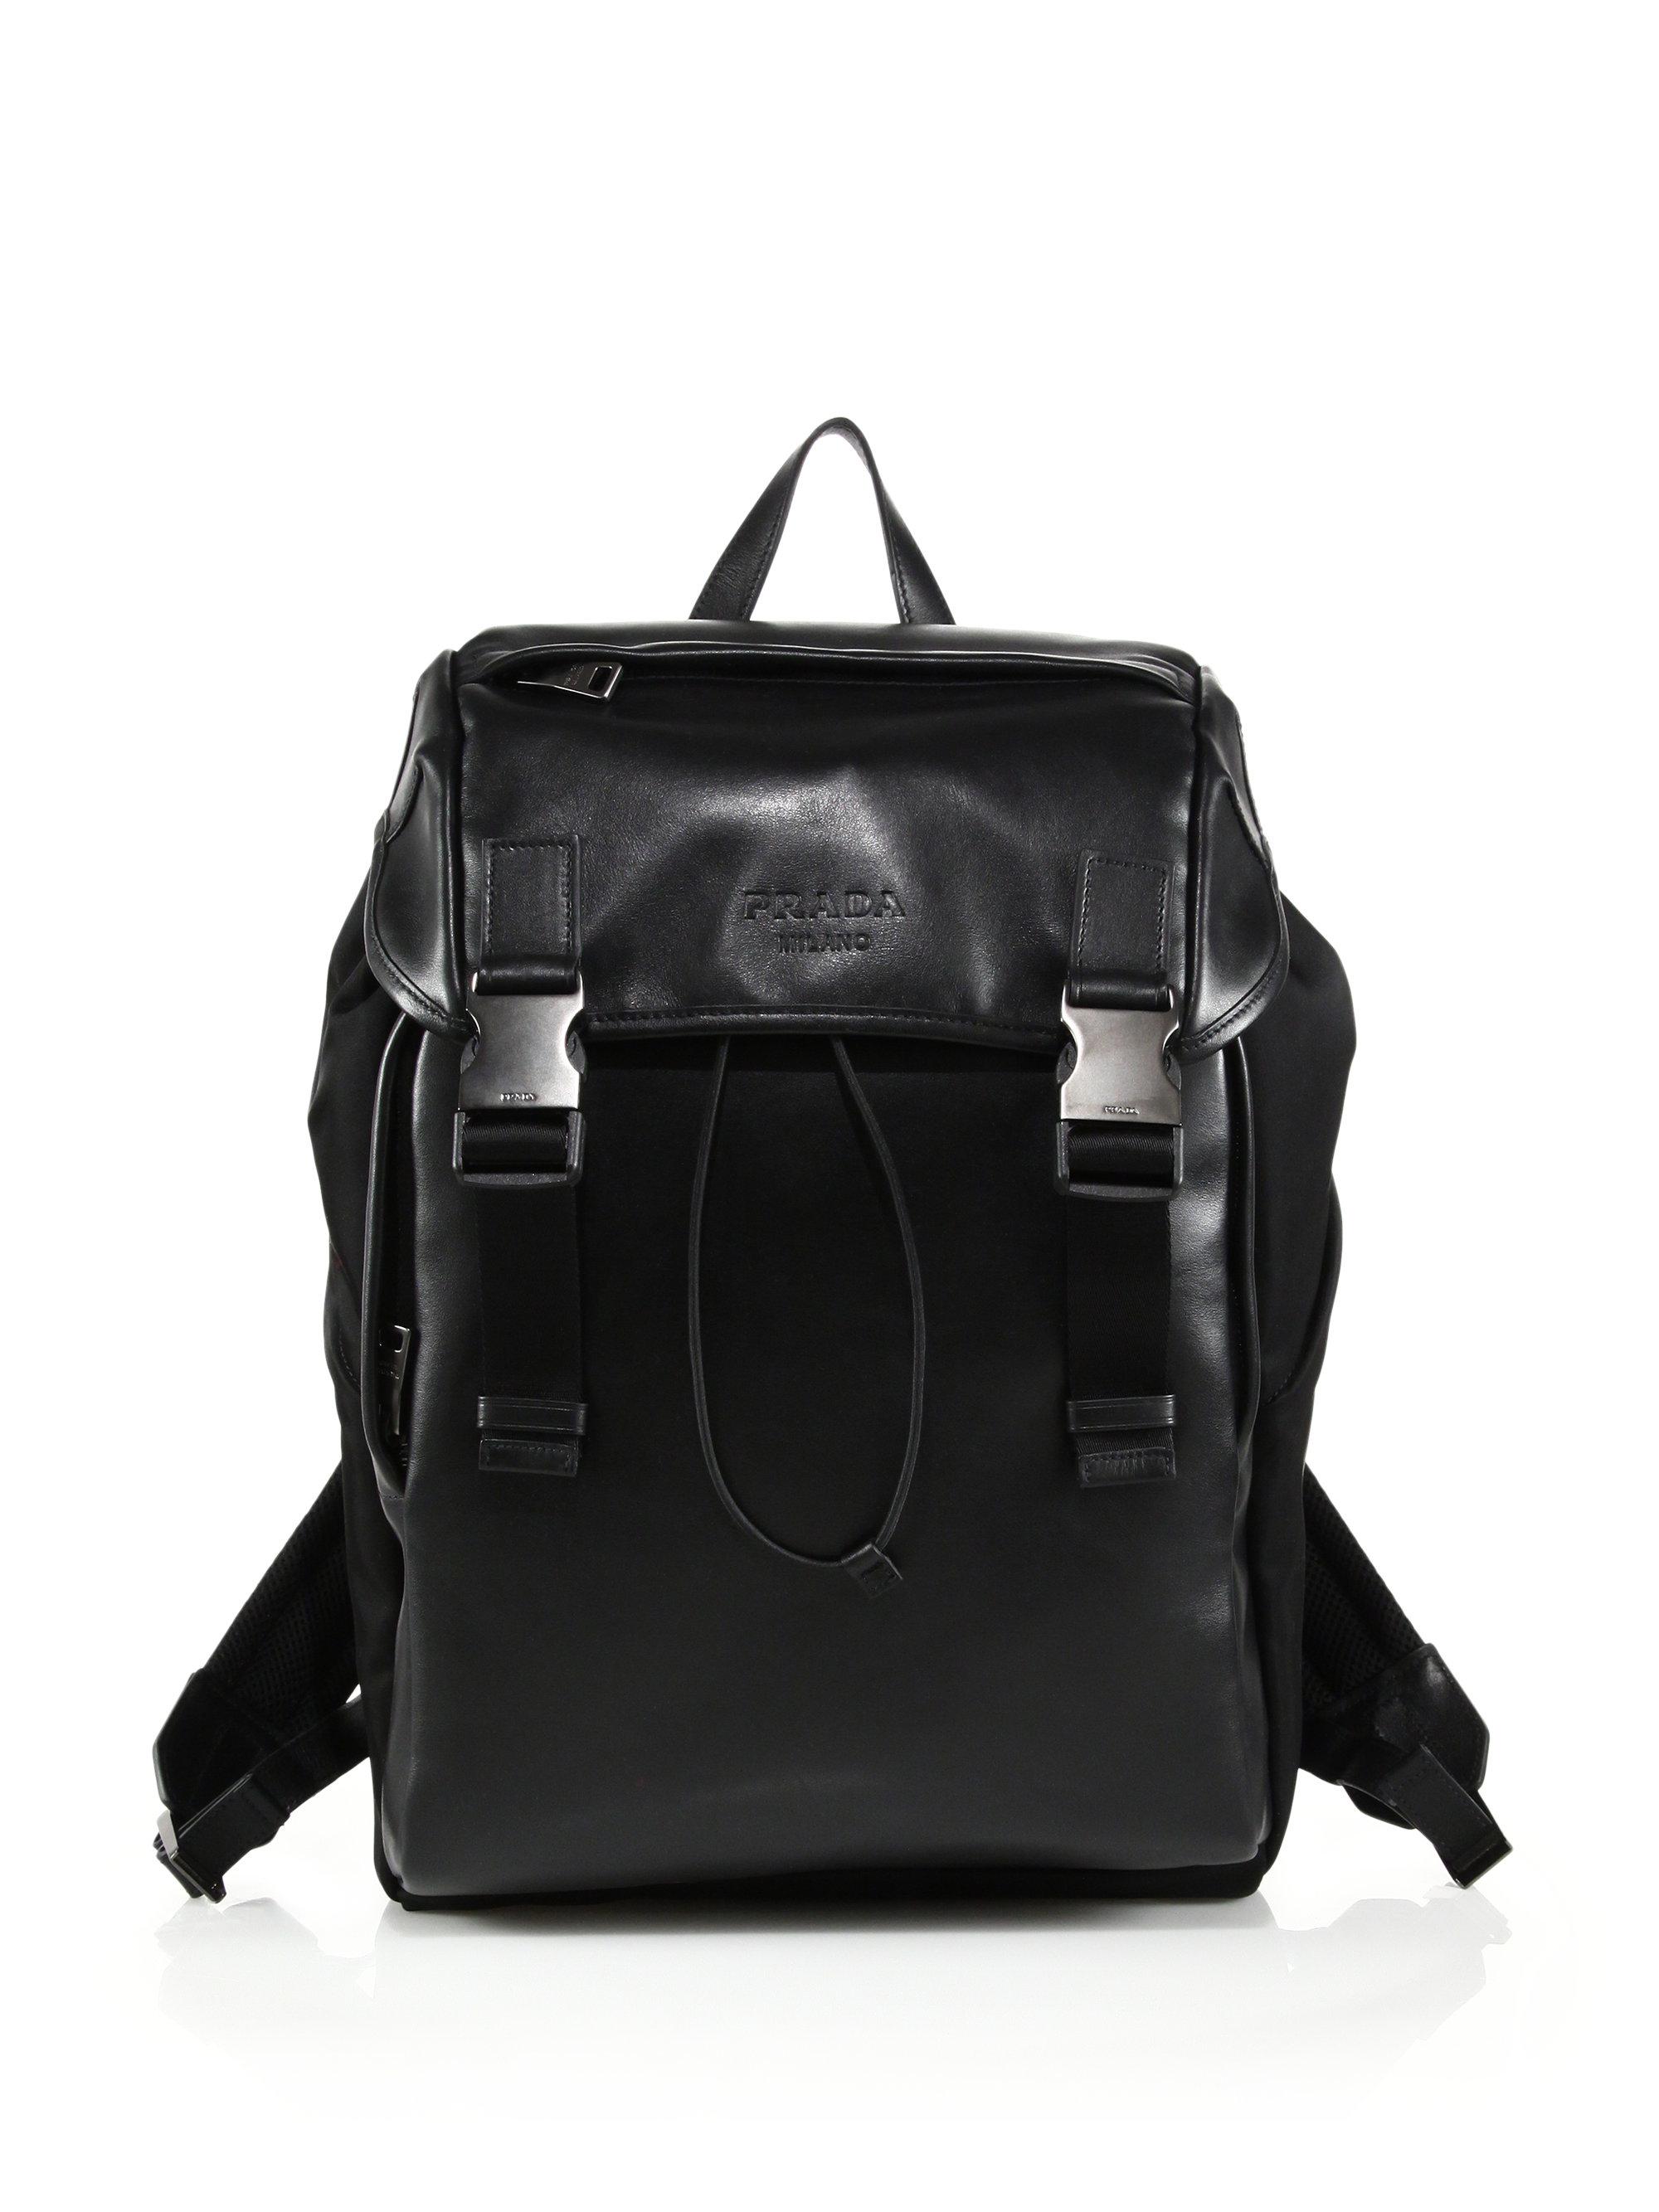 9f9f15ea1318 ... best price lyst prada soft calf nylon backpack in black for men e7cae  714a9